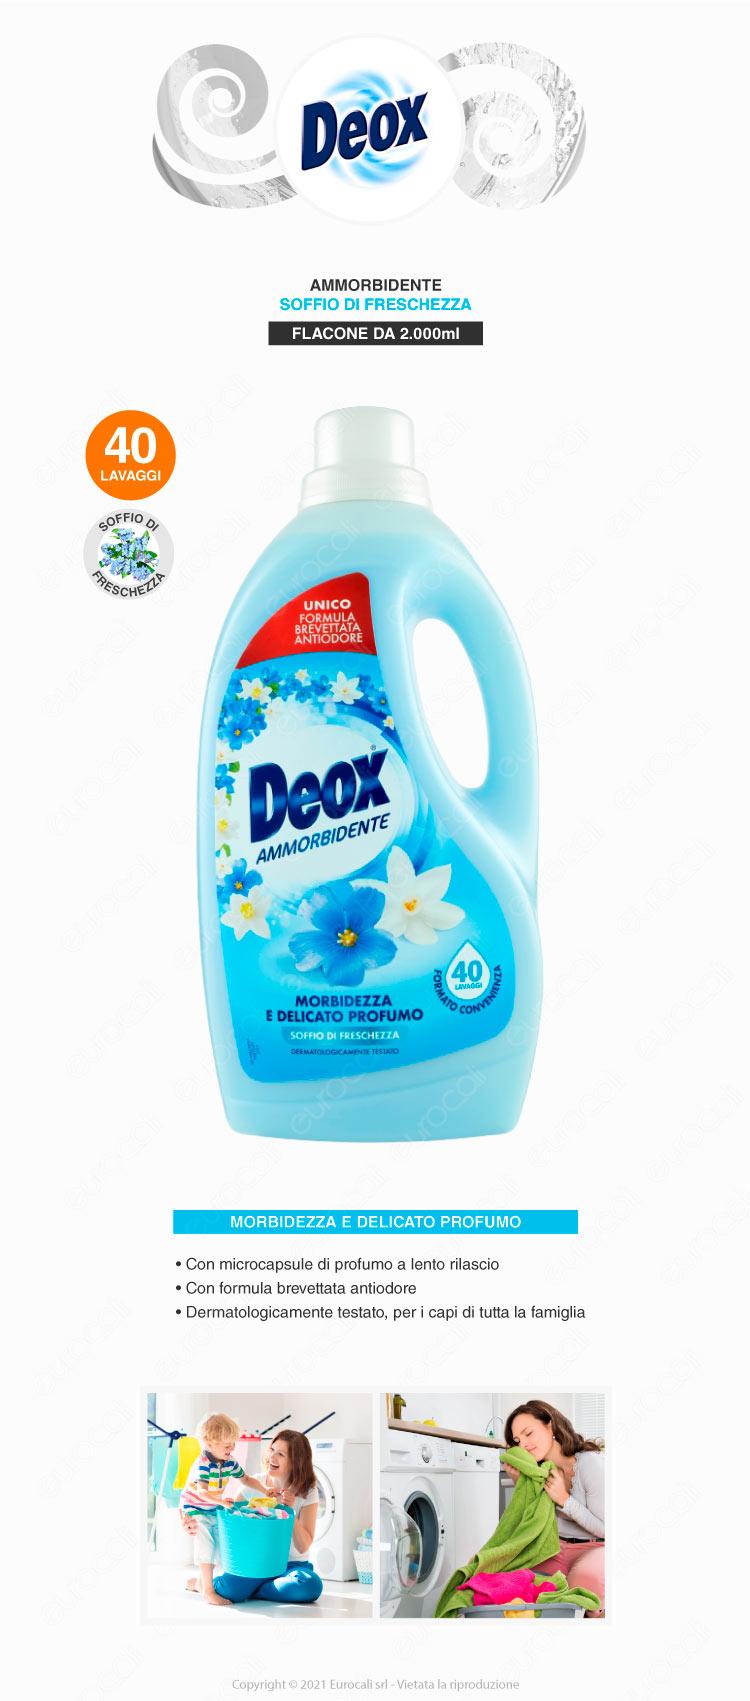 deox ammorbidente soffio di freschezza